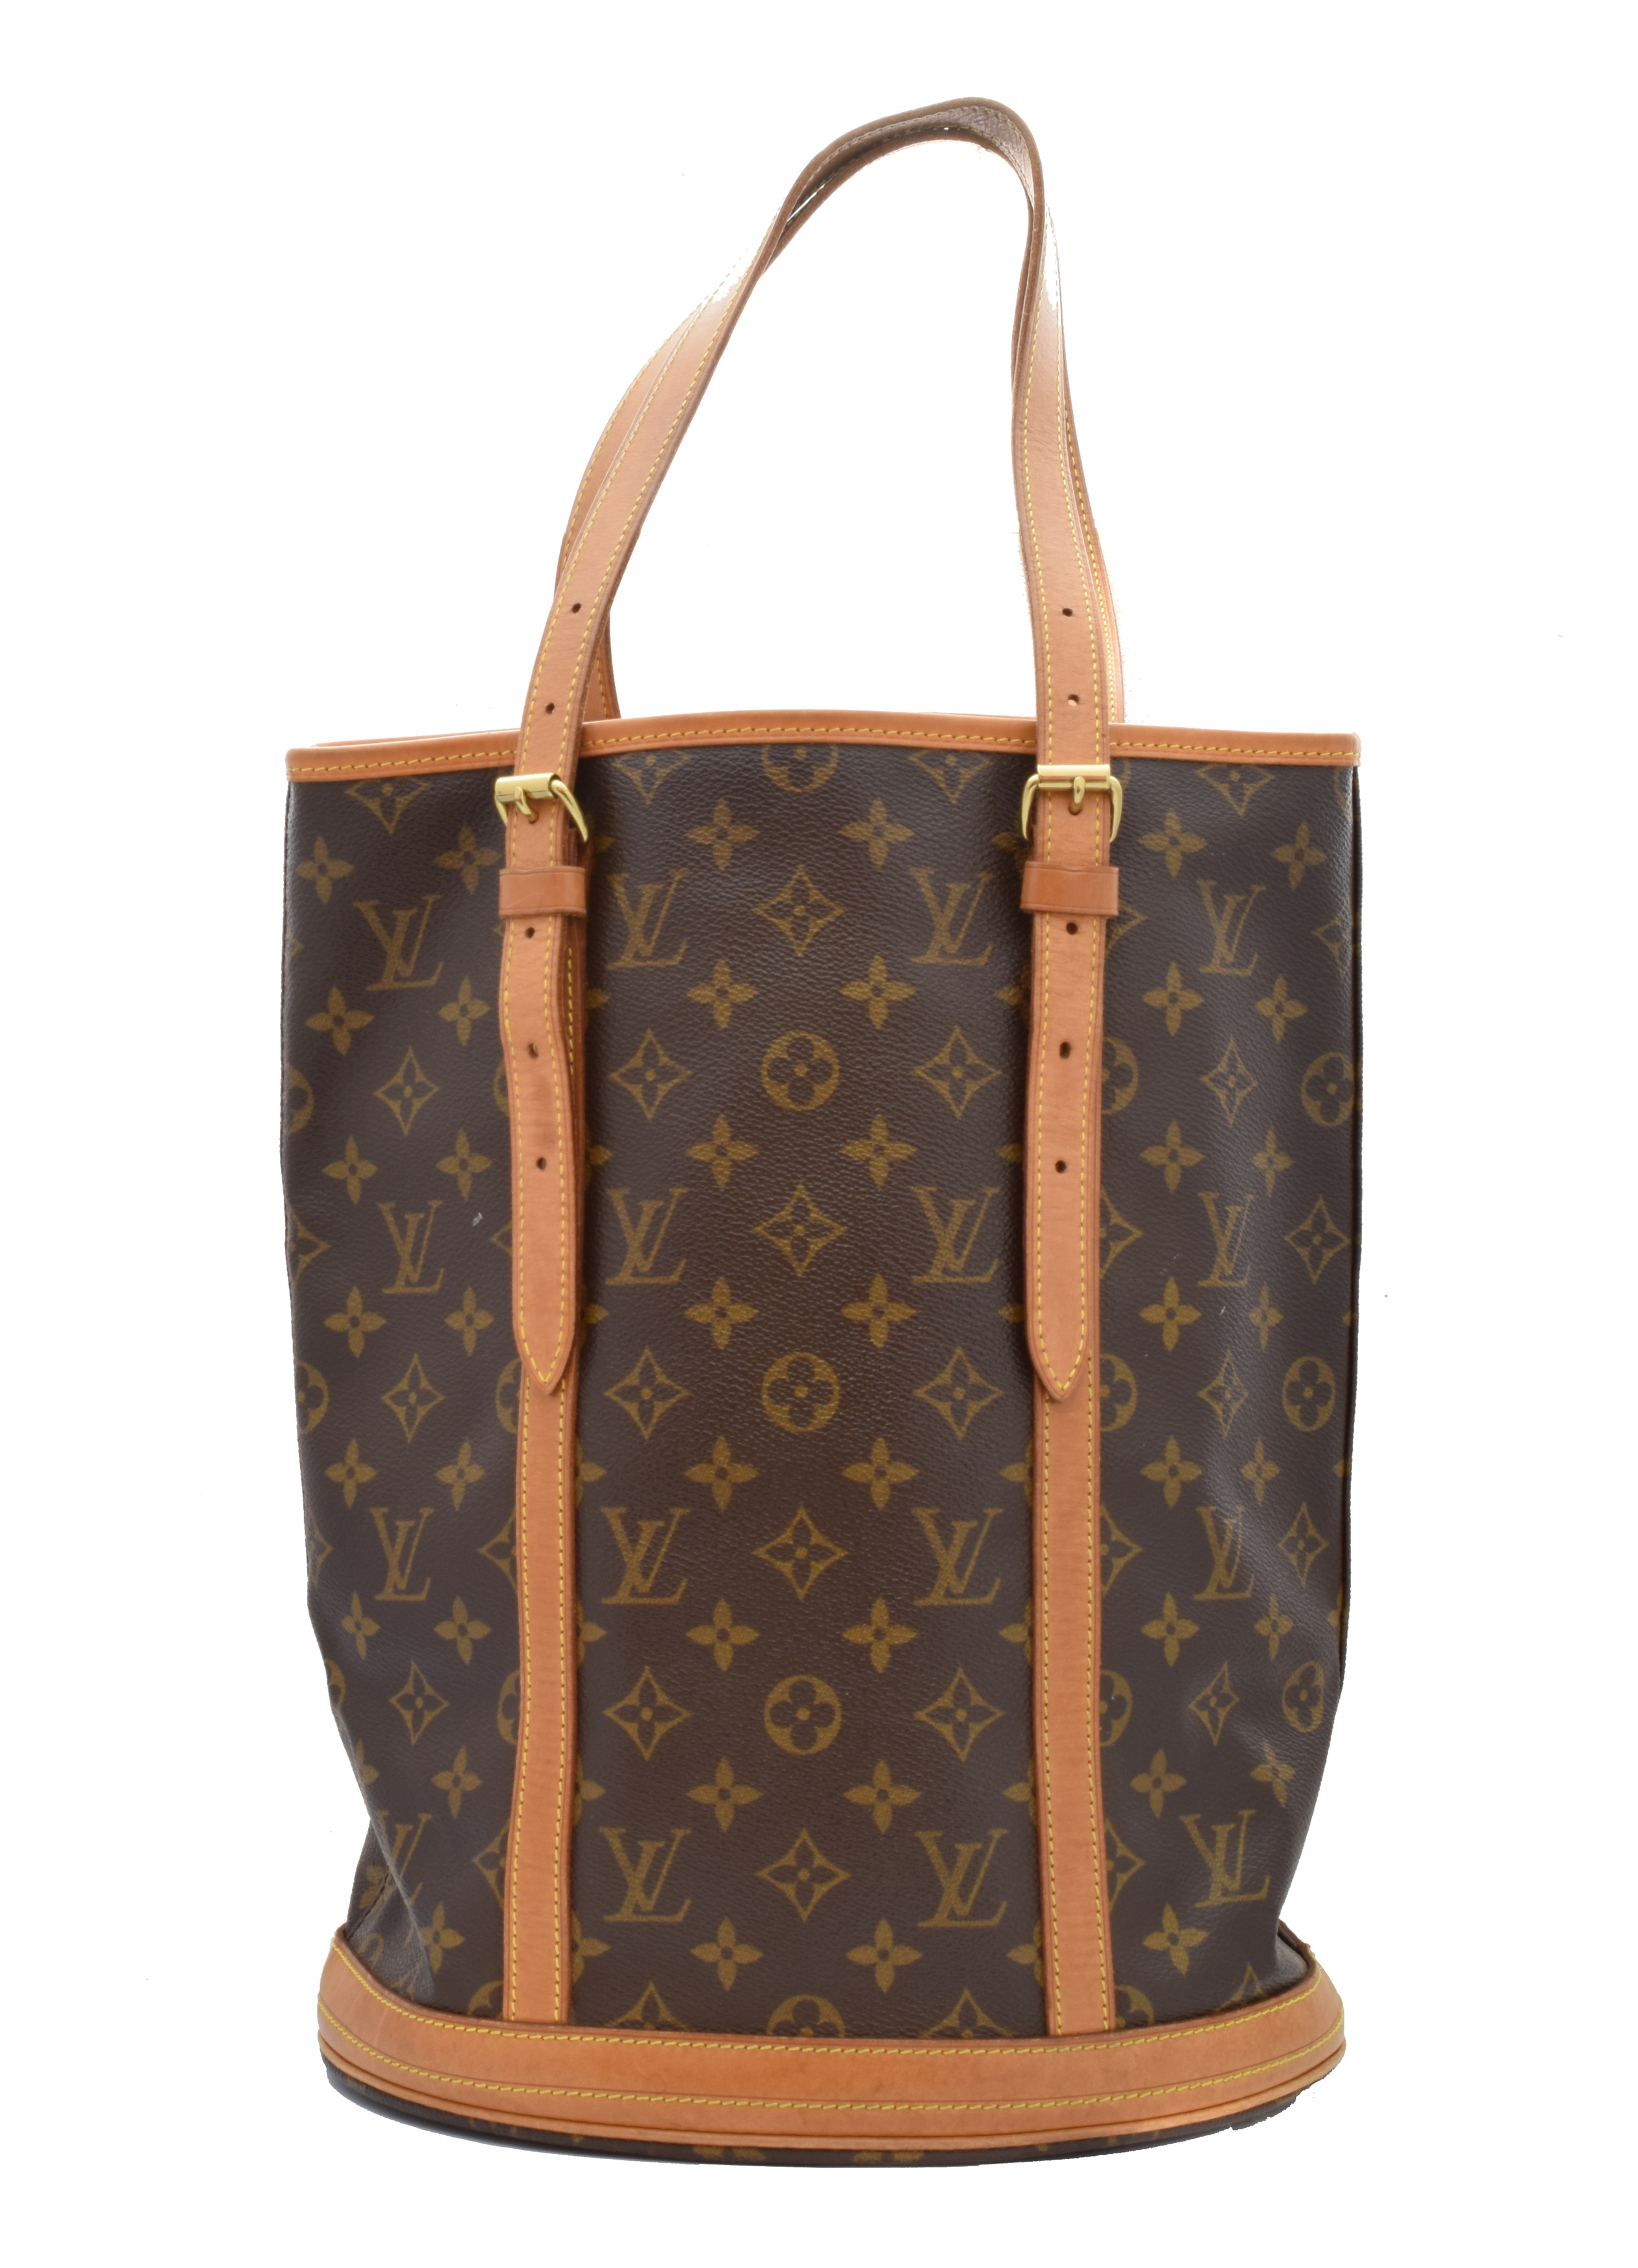 A Louis Vuitton Monogram Bucket Shoulder Bag, - Image 2 of 2